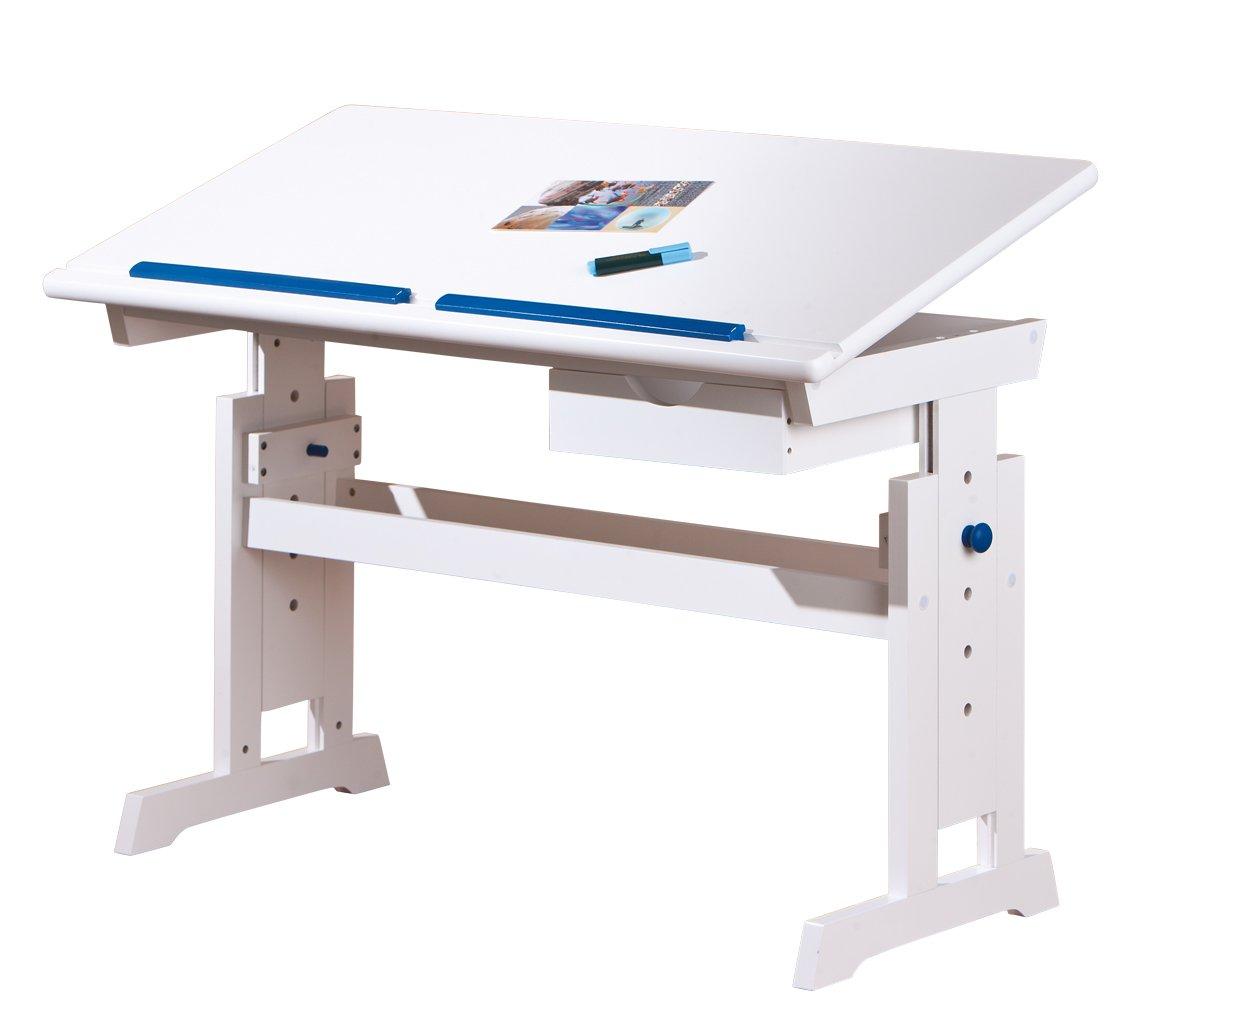 Links Baru 40100500 Children's Desk MDF/Solid Wood Adjustable Height and Tilt 1 Drawer 109 x 55 x 63/88 cm White/Pink/Blue F00011901051_WHITE